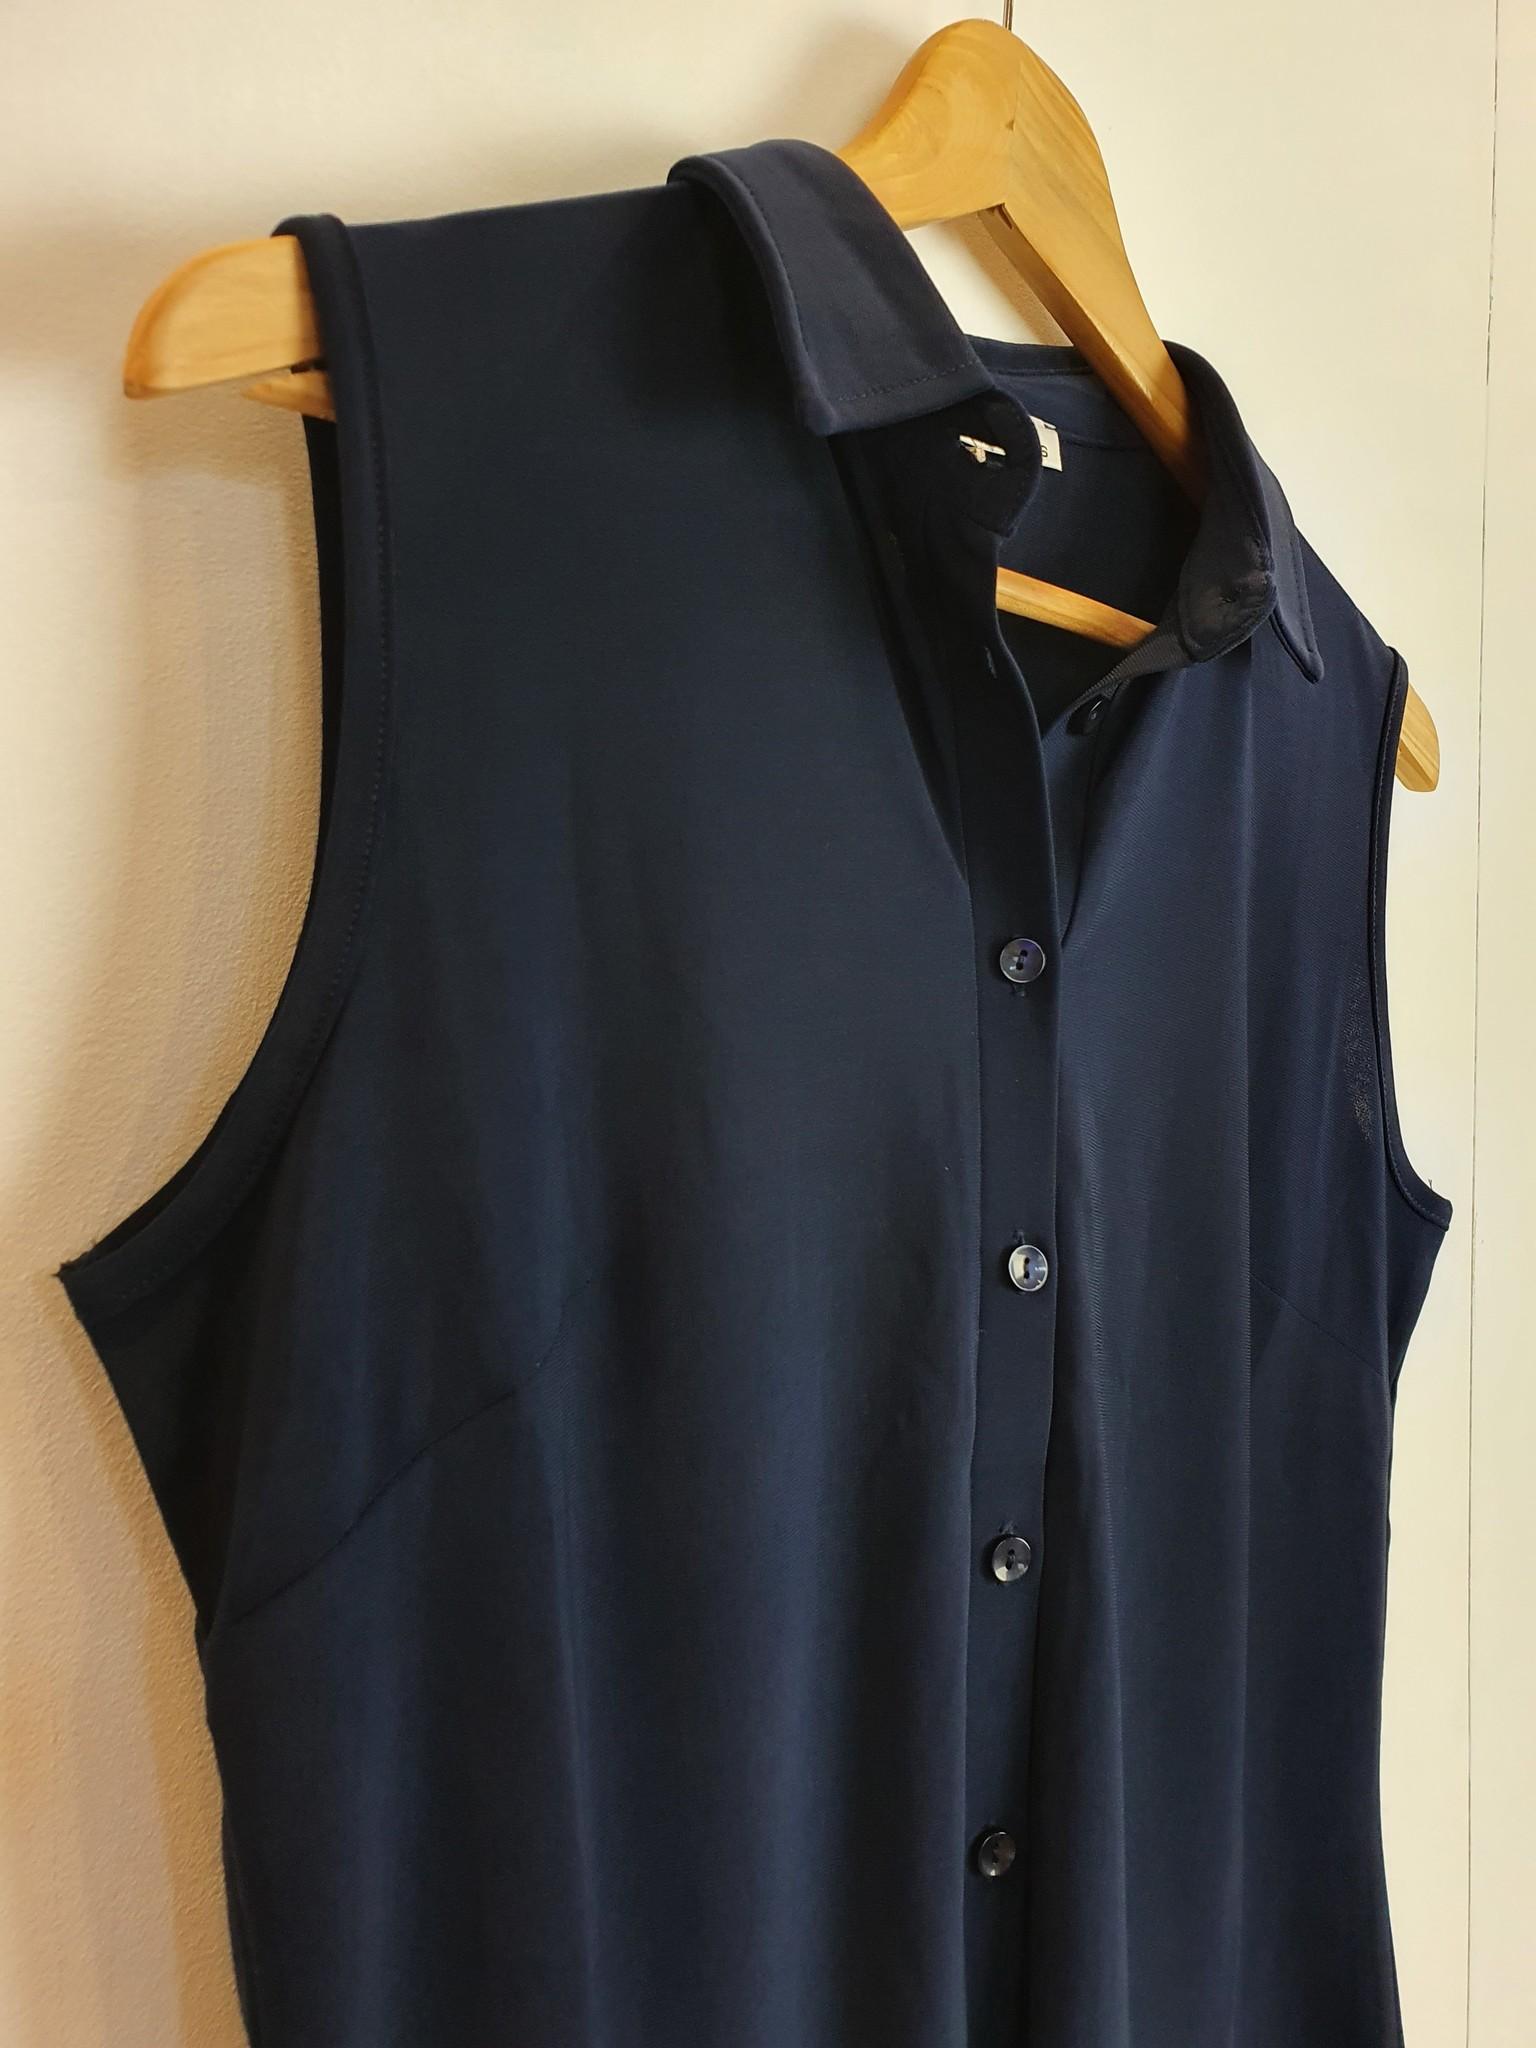 Angelle Milan Angelle Milan navy blouse